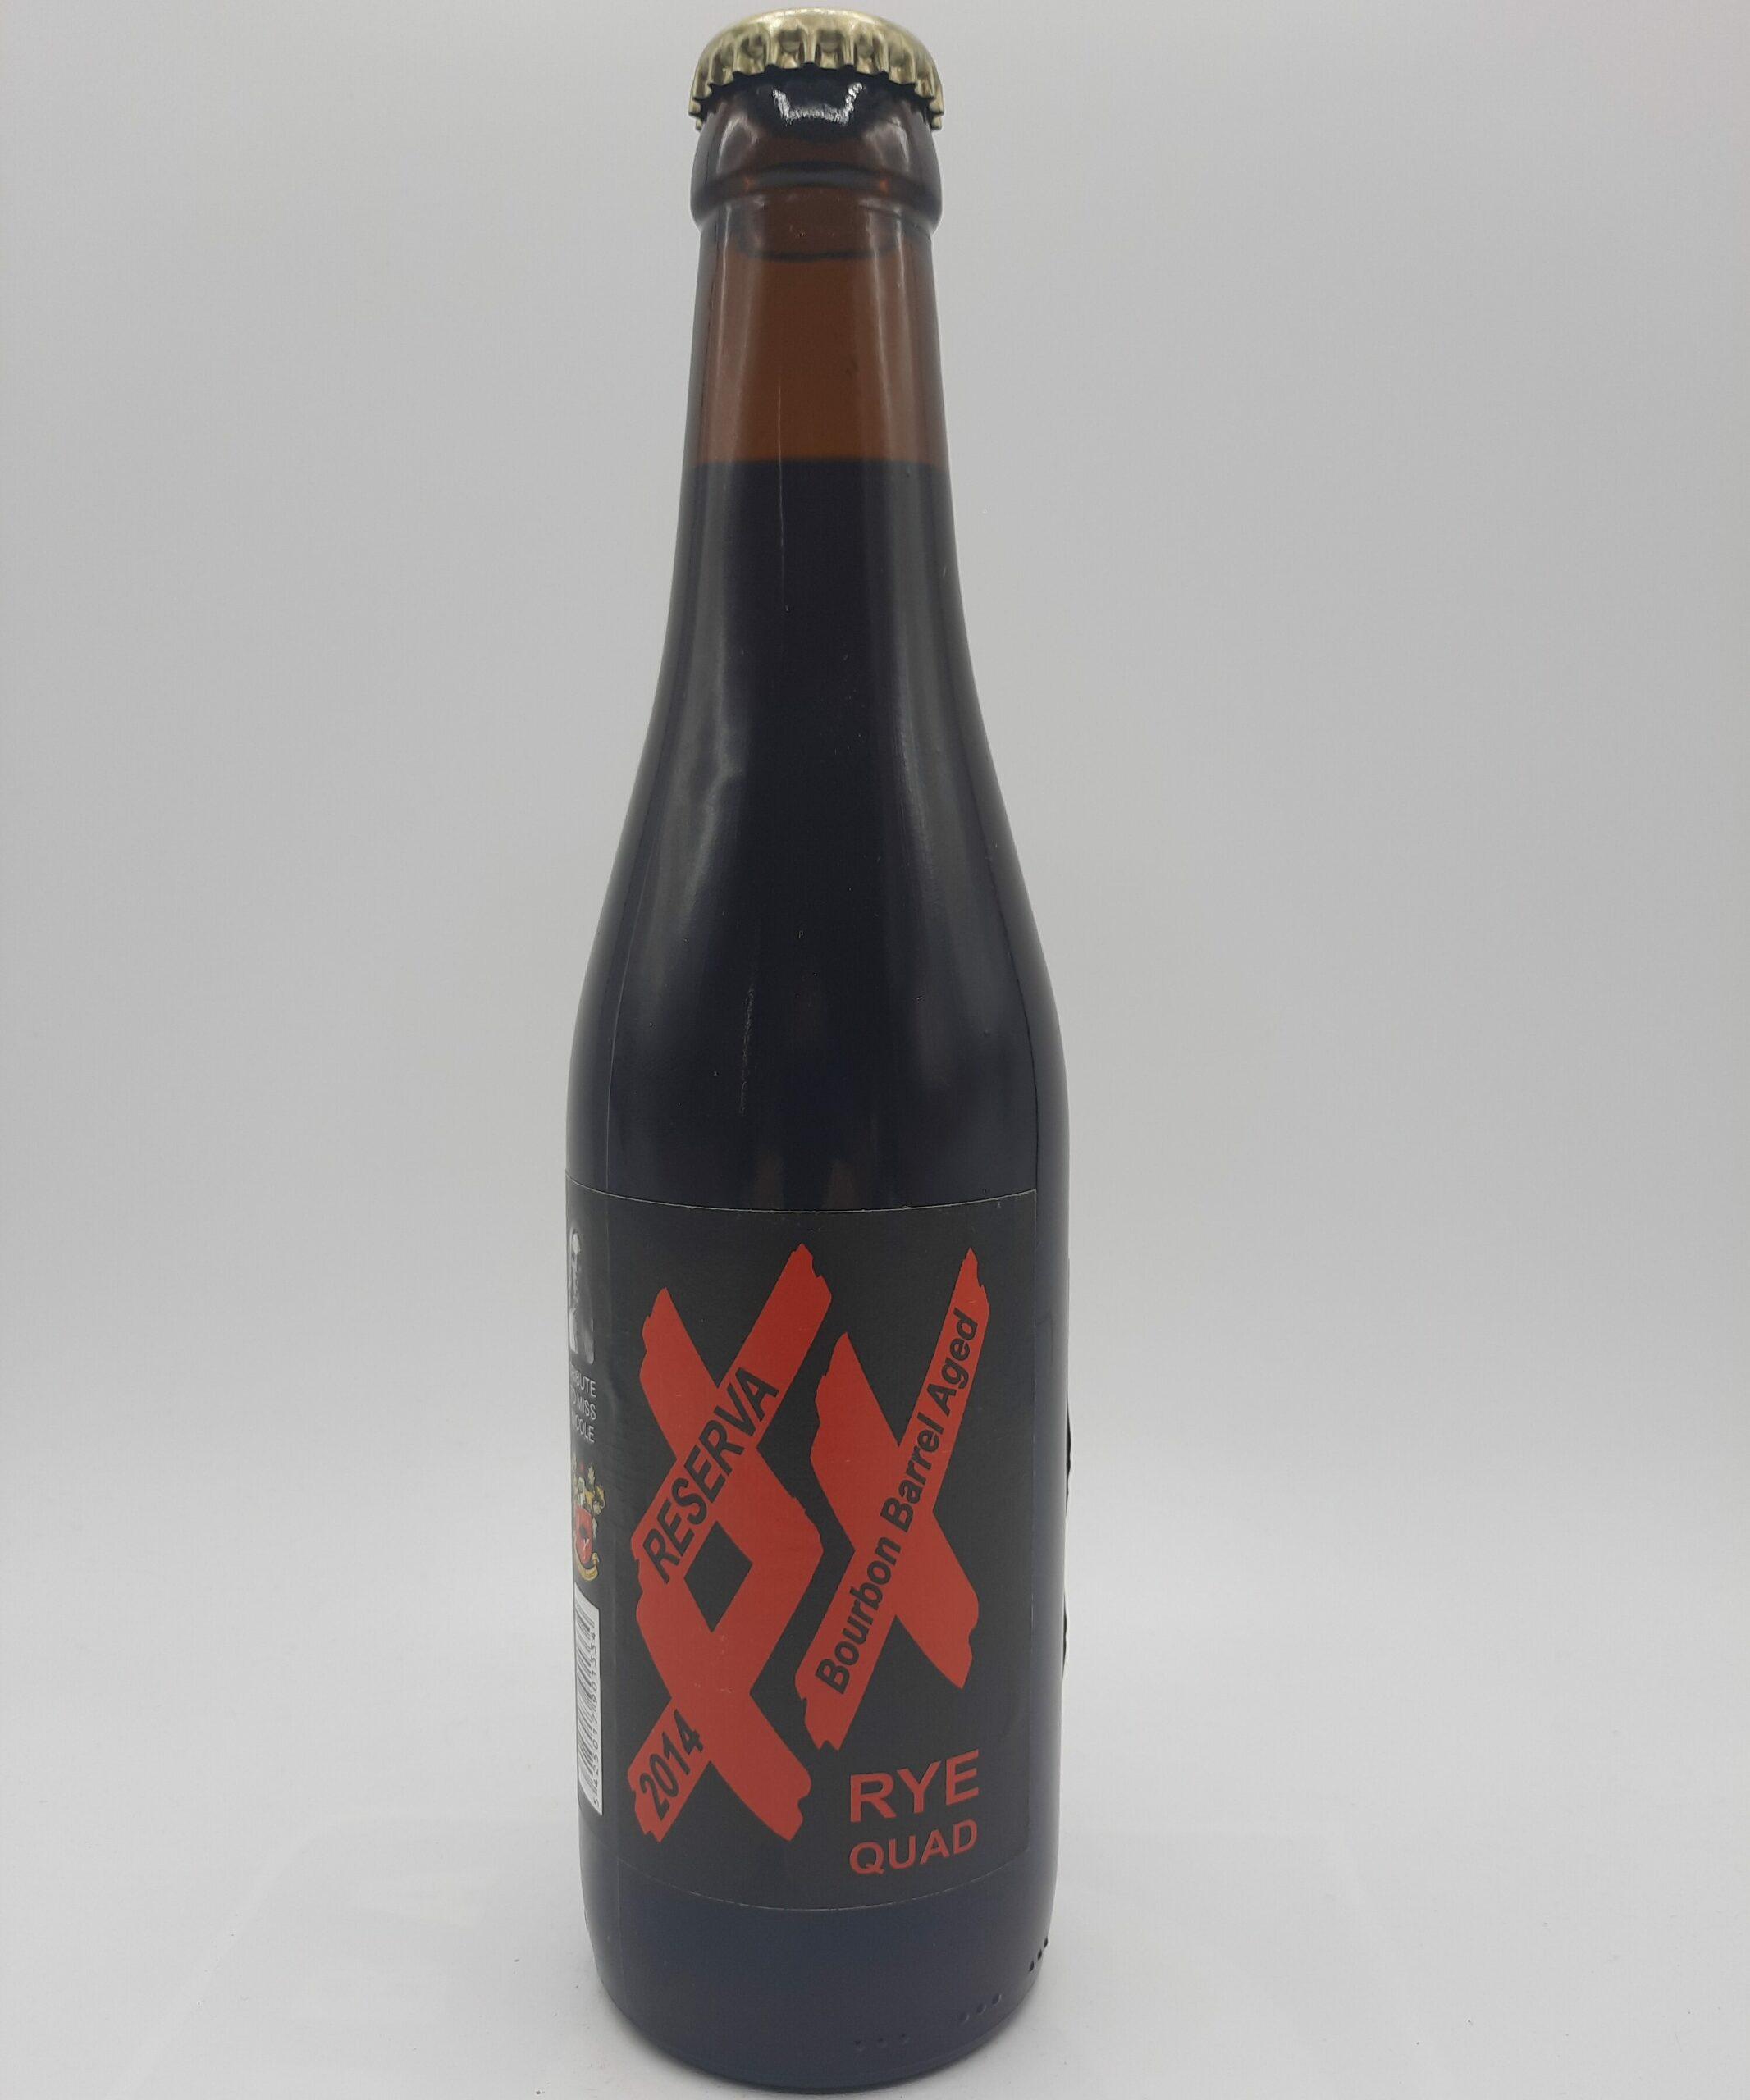 Image XXX Rye Quad Bourbon BA 2014